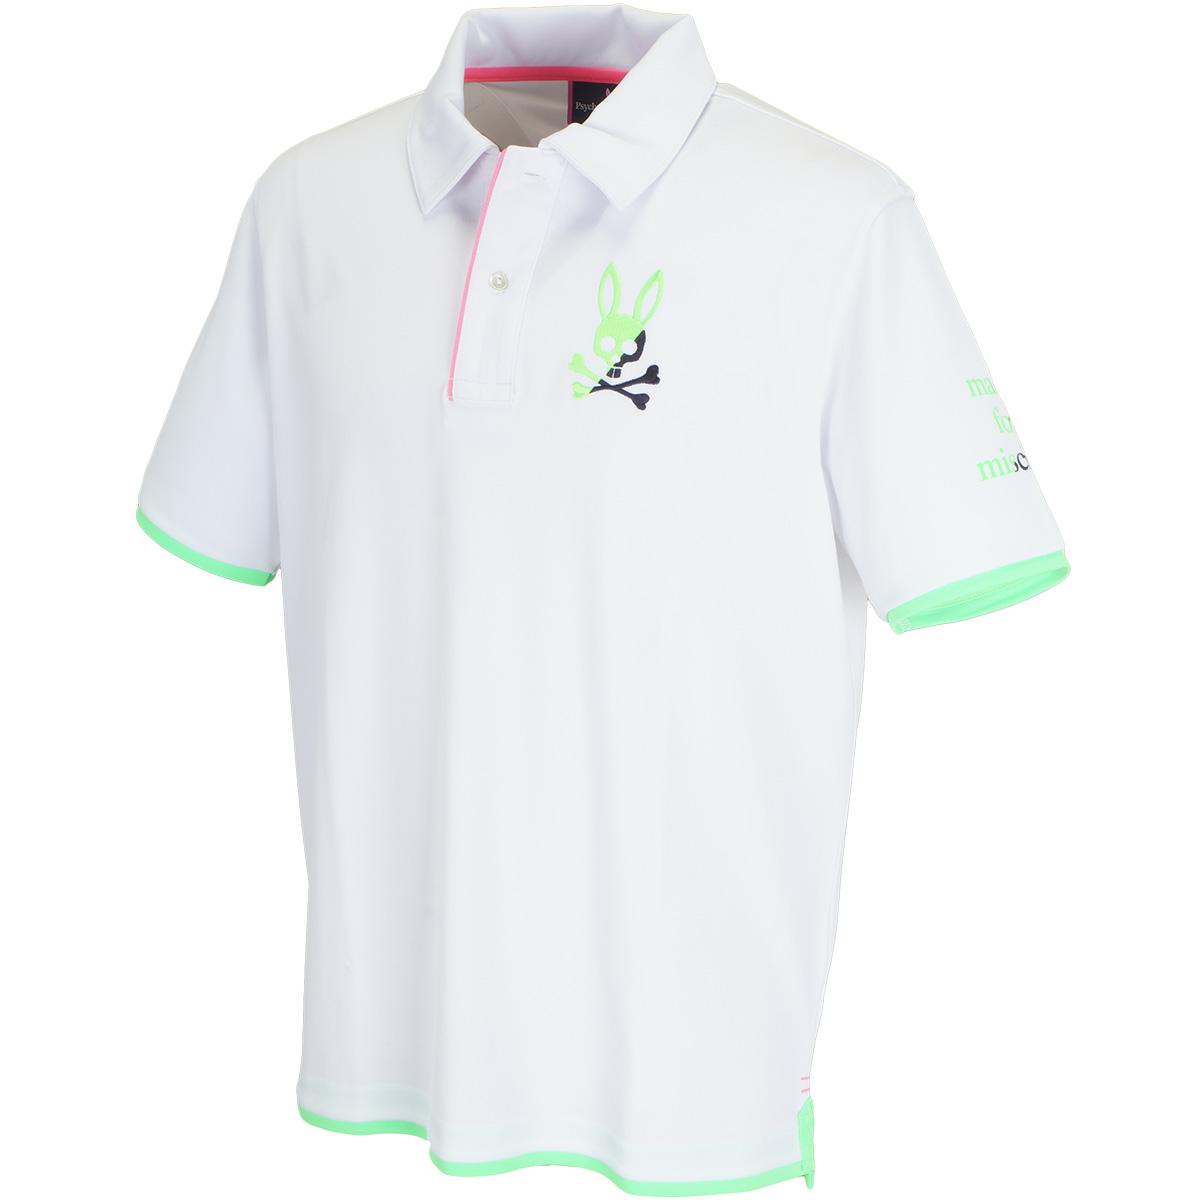 GDO限定 ネオン半袖ポロシャツ